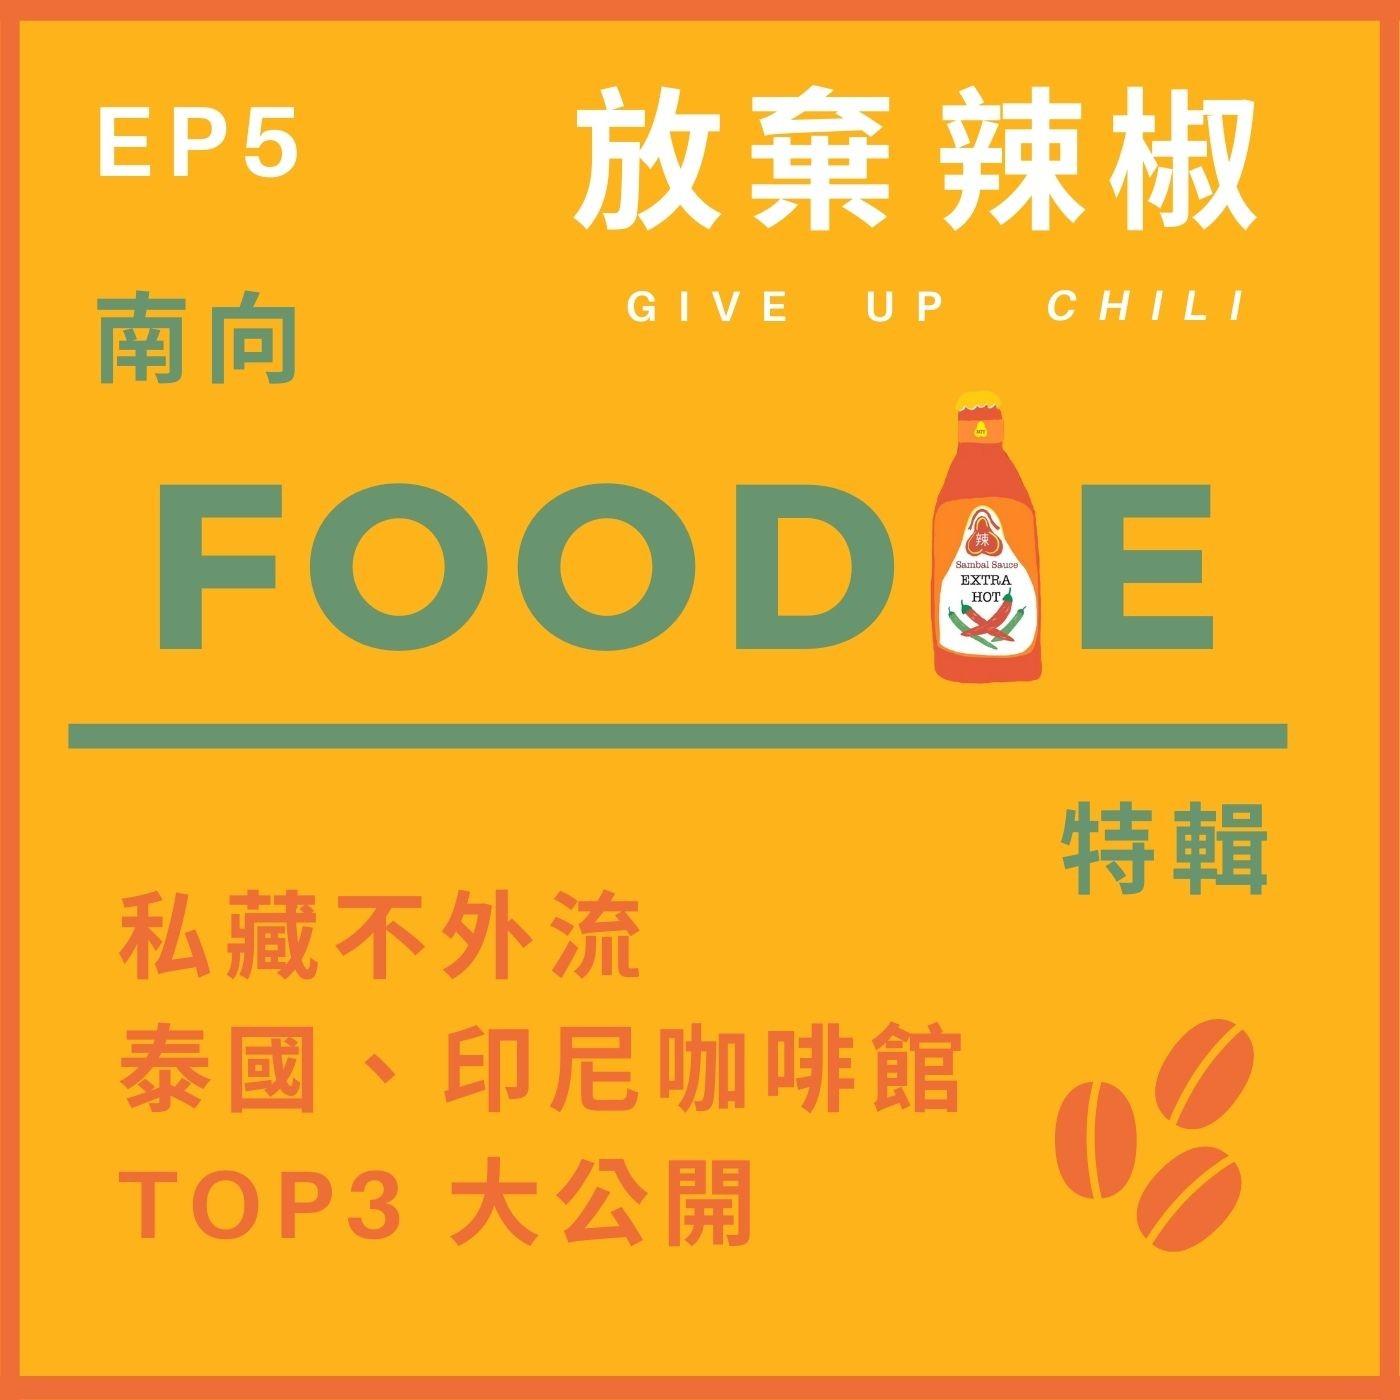 EP5:私藏不外流 - 泰國、印尼咖啡館 Top 3 大公開